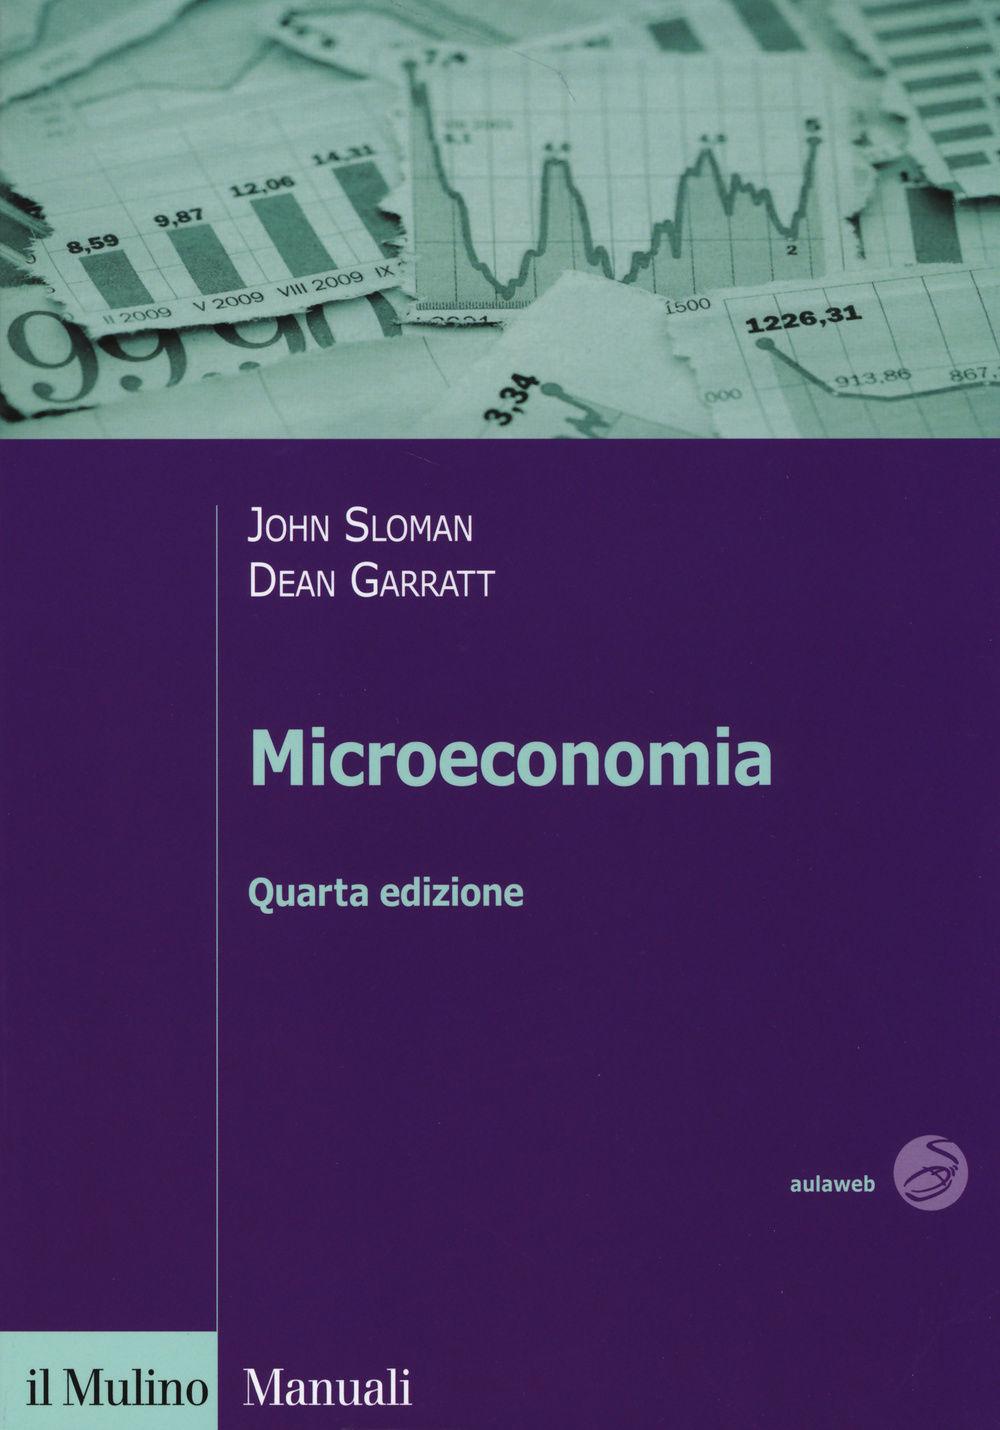 Microeconomia. John Sloman, Dean Garratt